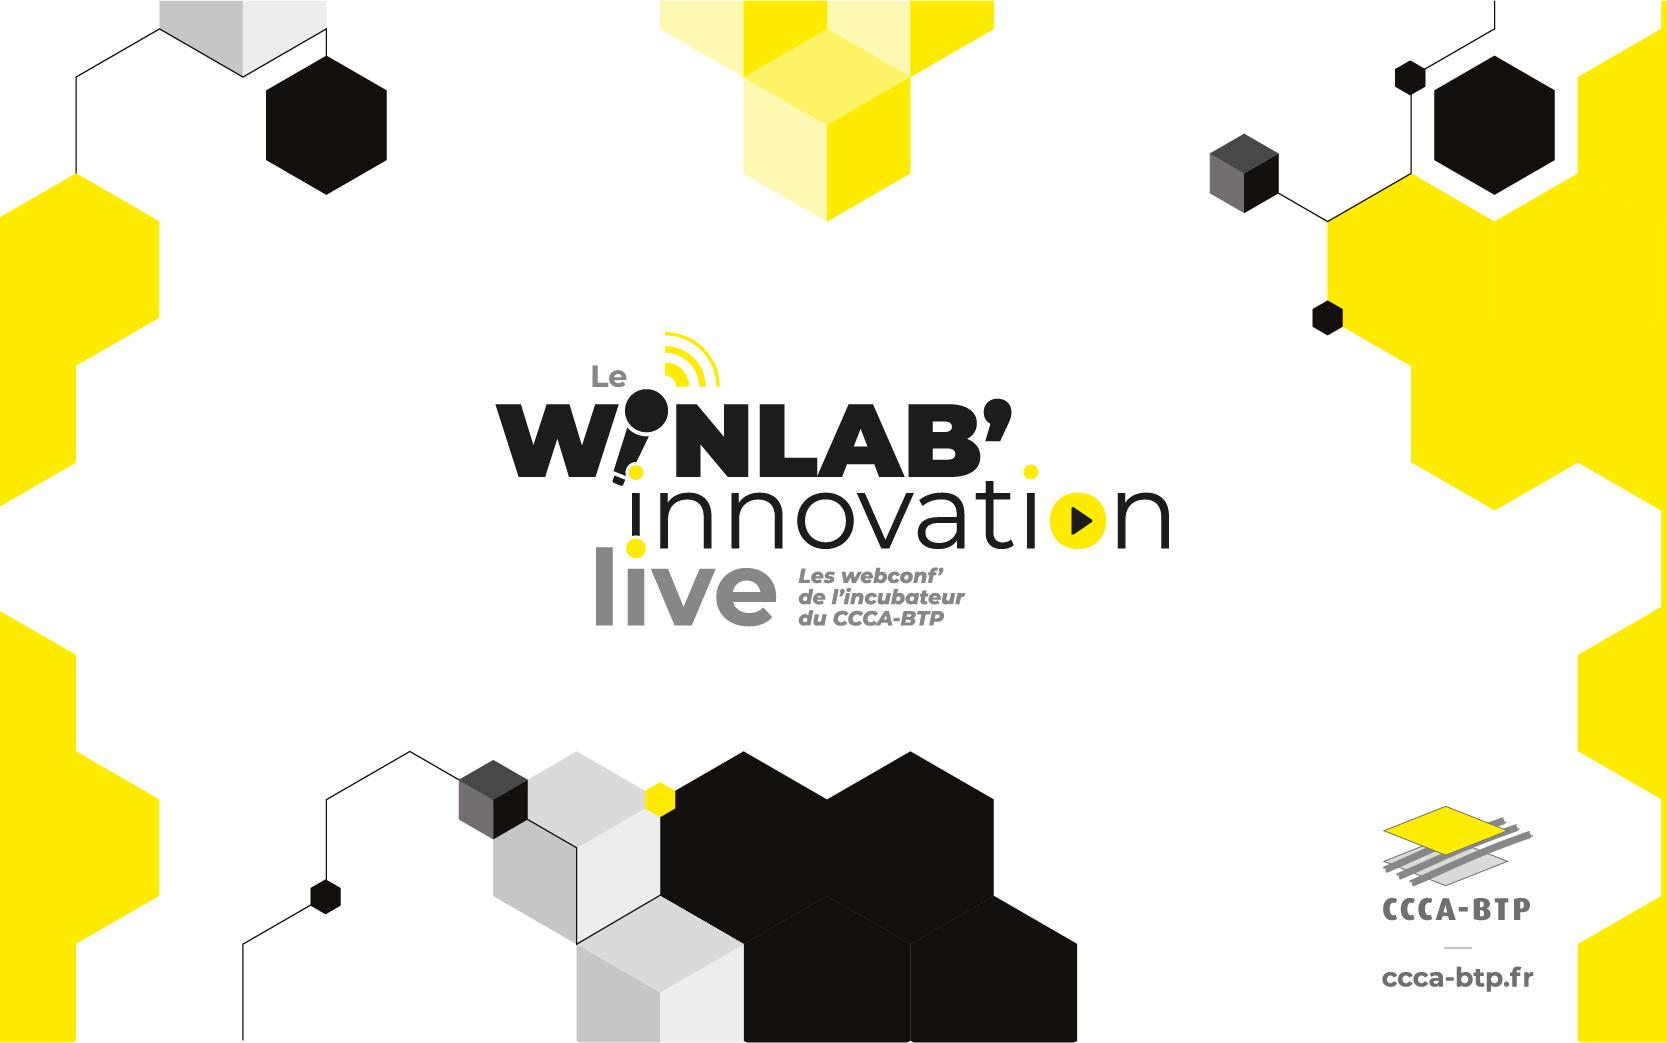 Winlab innovation live